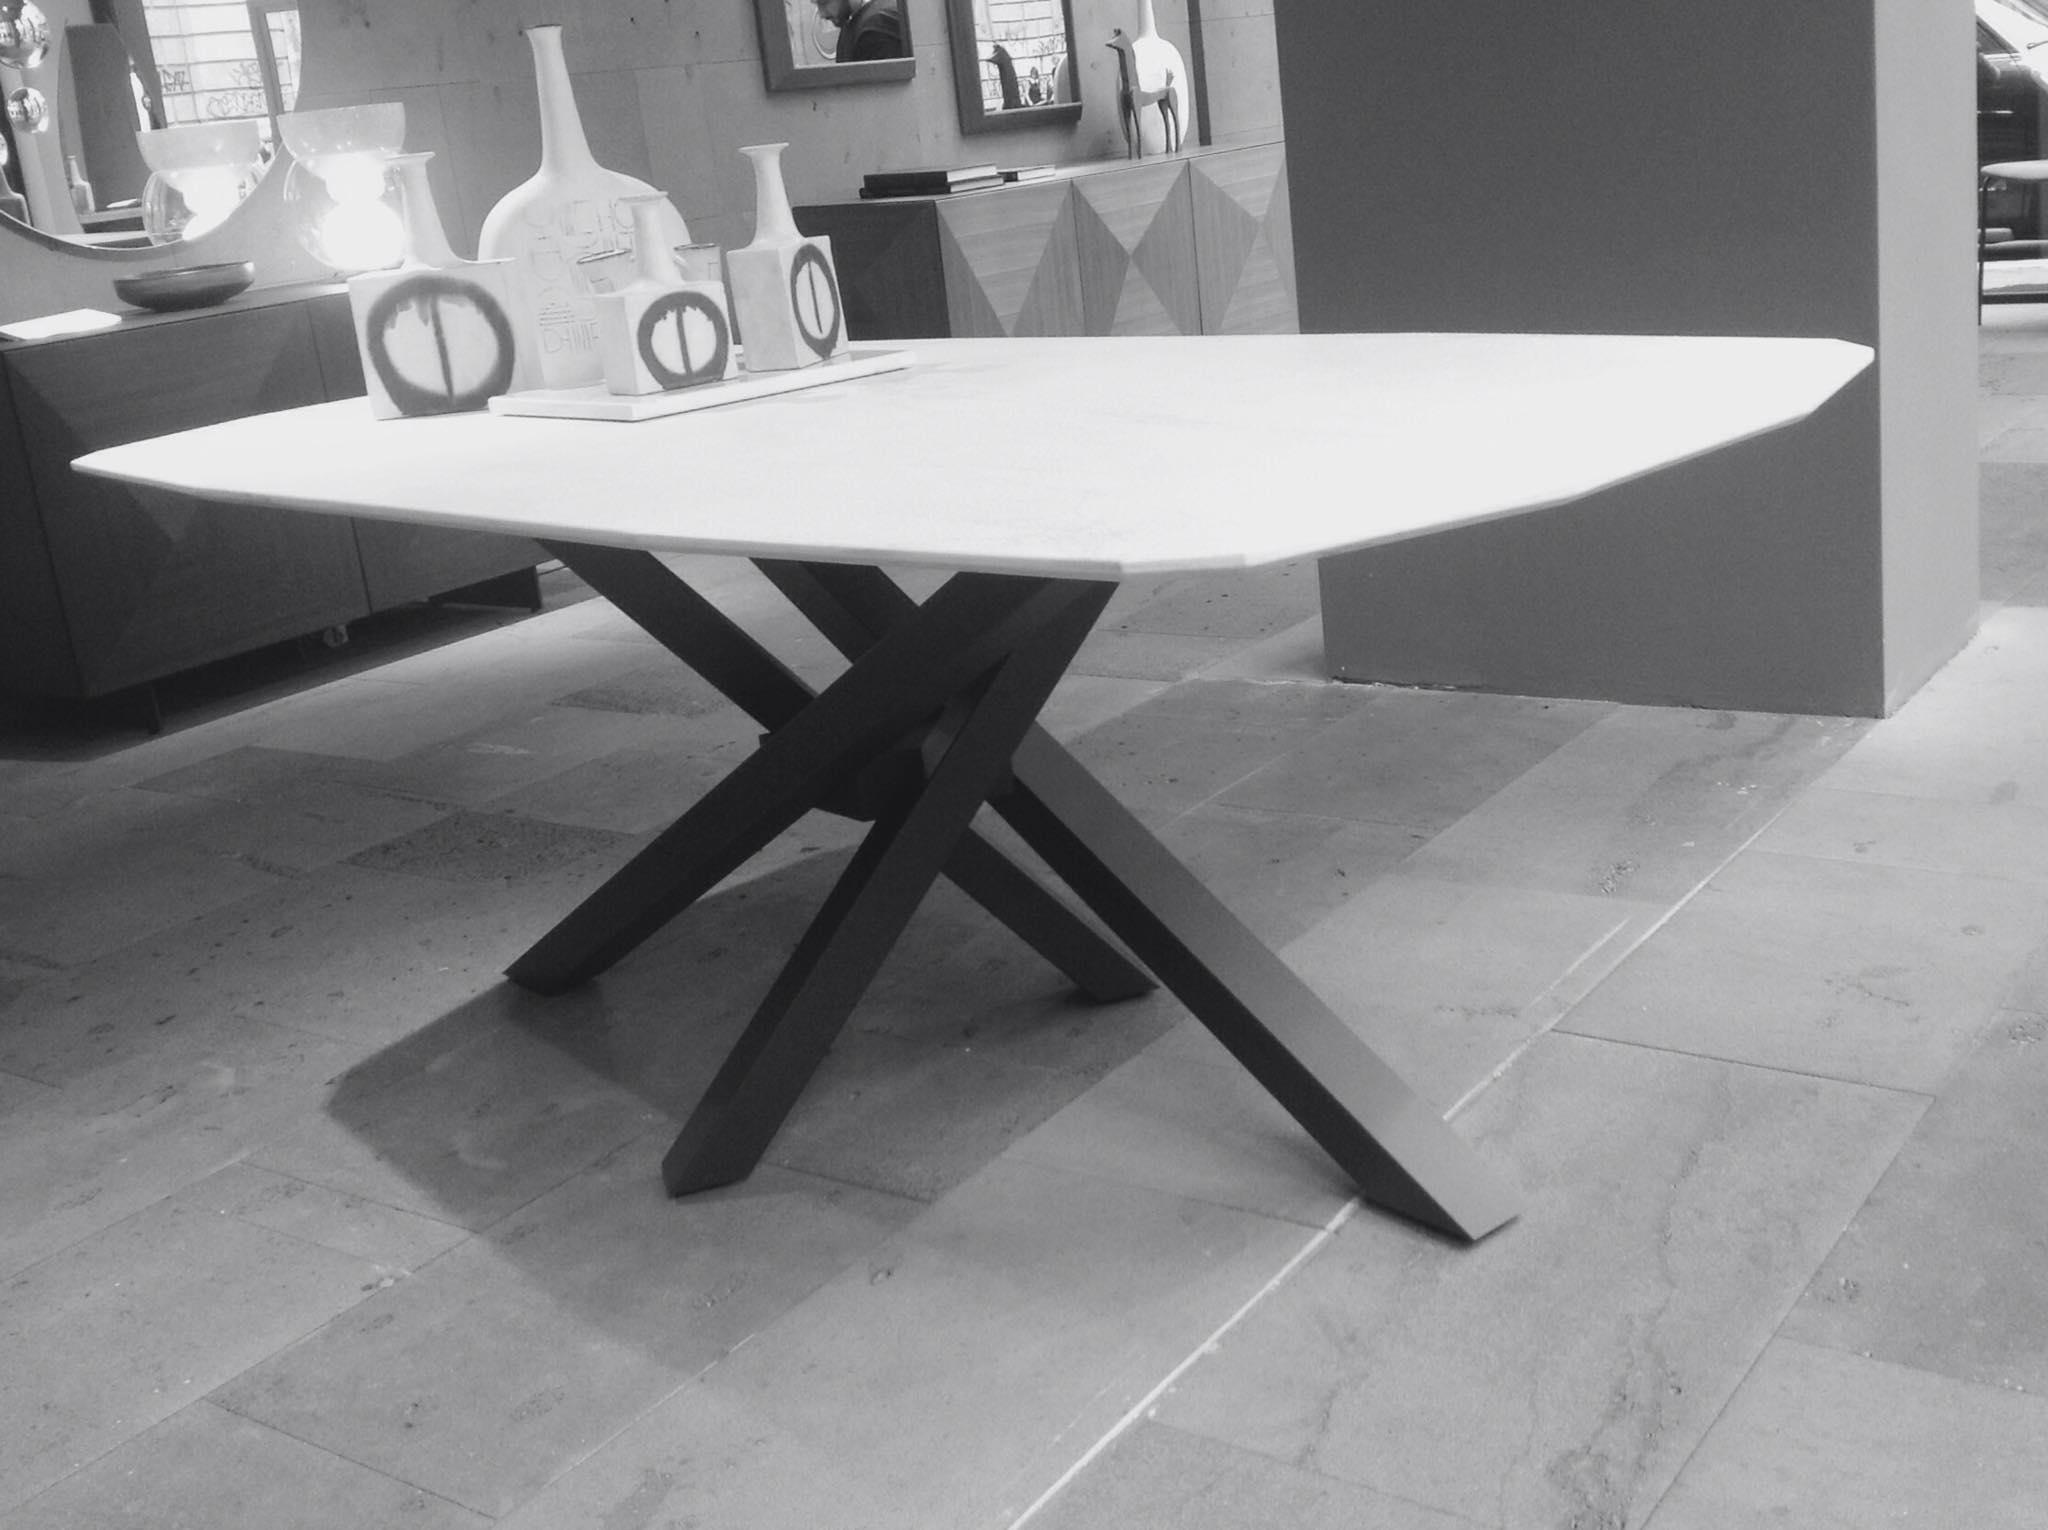 Tavolo shangai riflessi piano in marmo -